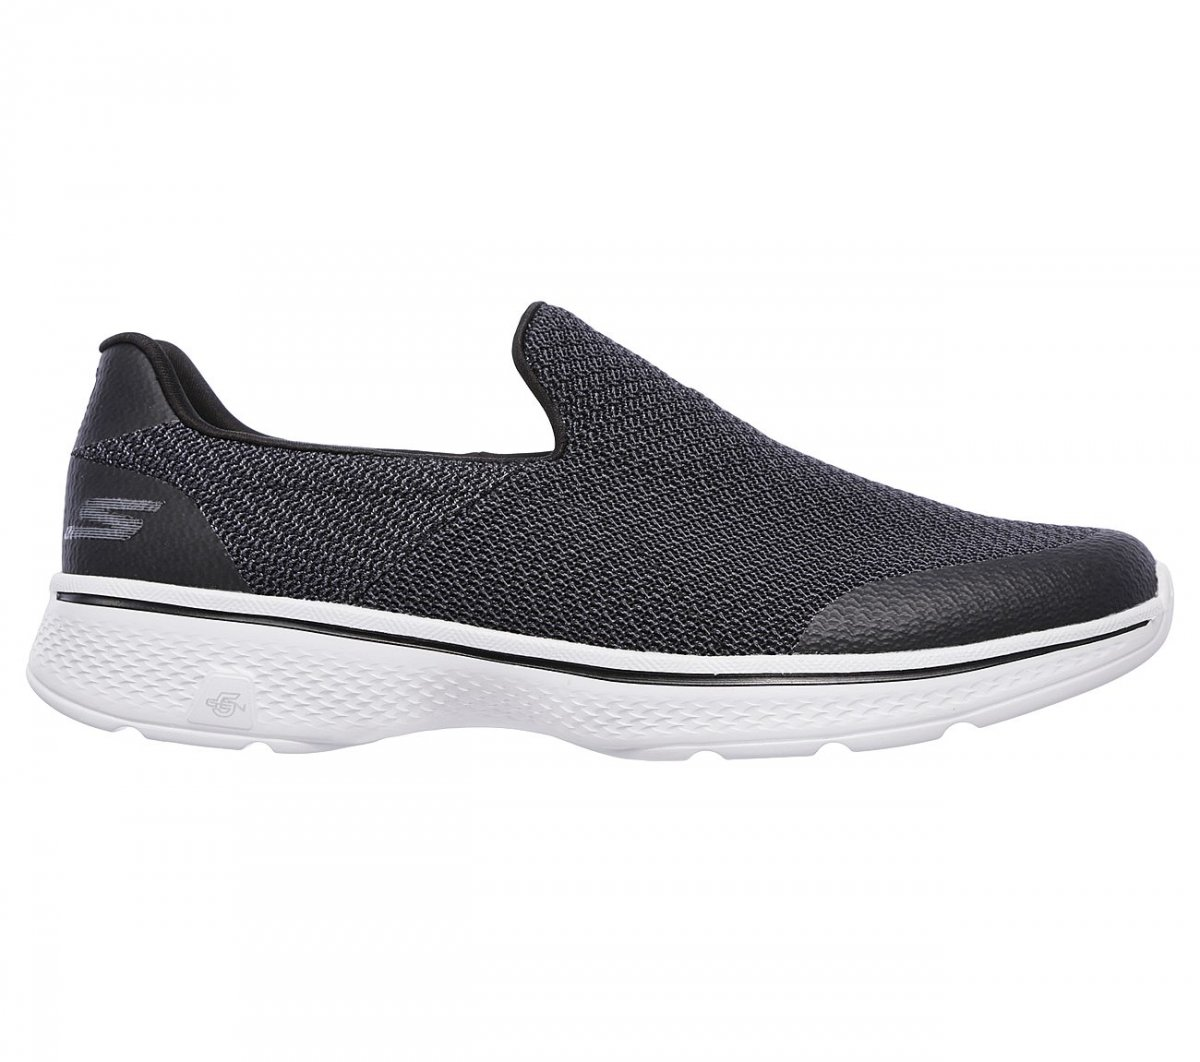 052671621 Bizz Store - Tênis Masculino Skechers GO Walk 4 Expert